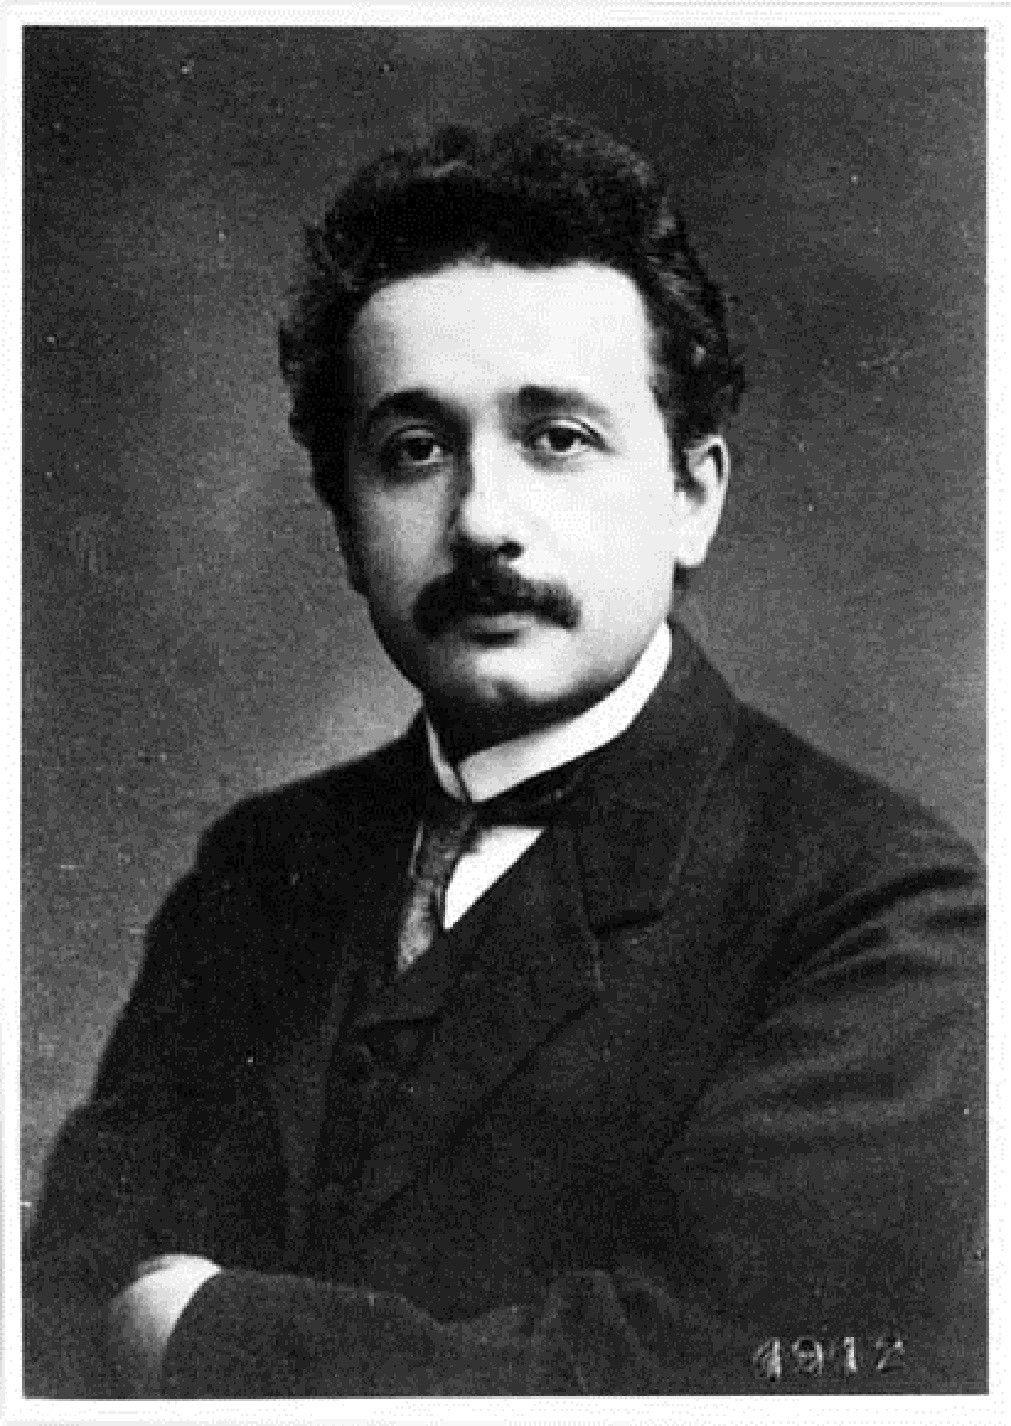 Albert Einstein 1912 Young Albert Einstein Albert Einstein